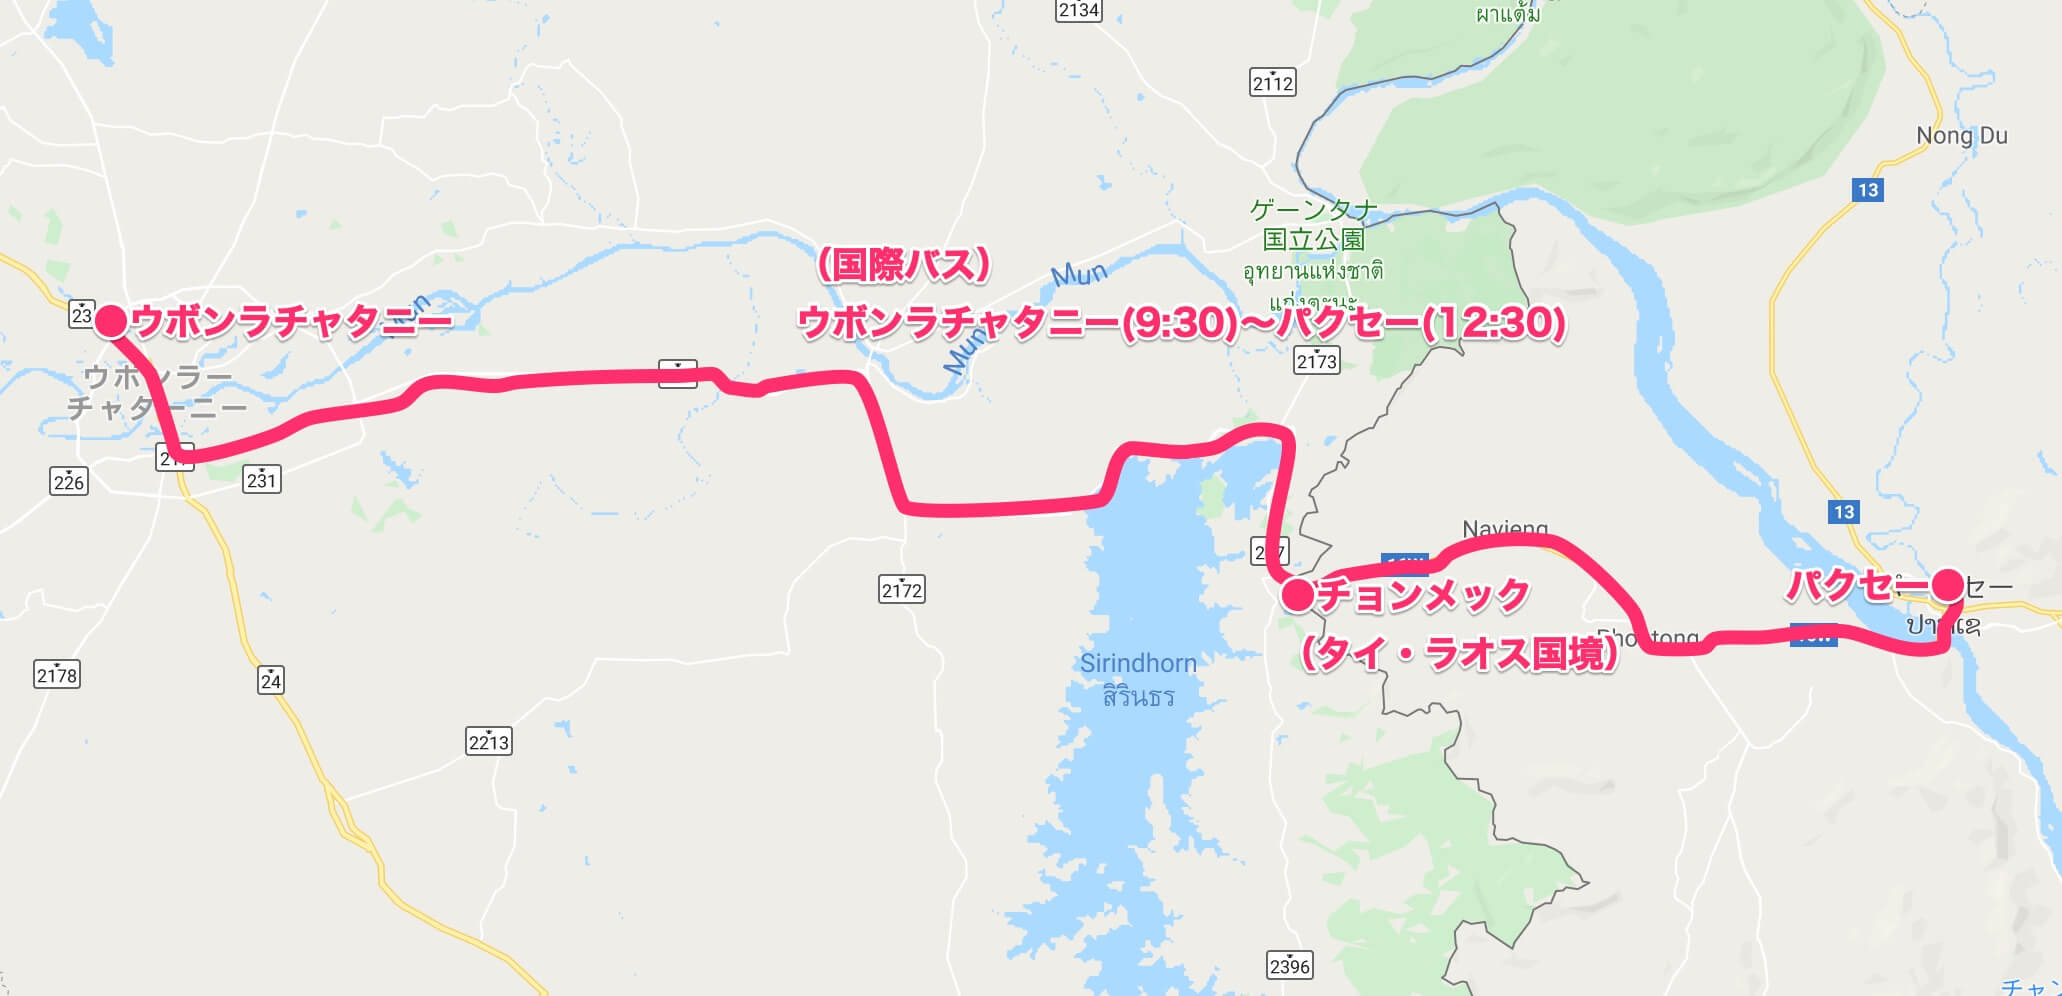 MAP3バンコク〜パクセー(国際バス)【タイ・ラオス②】